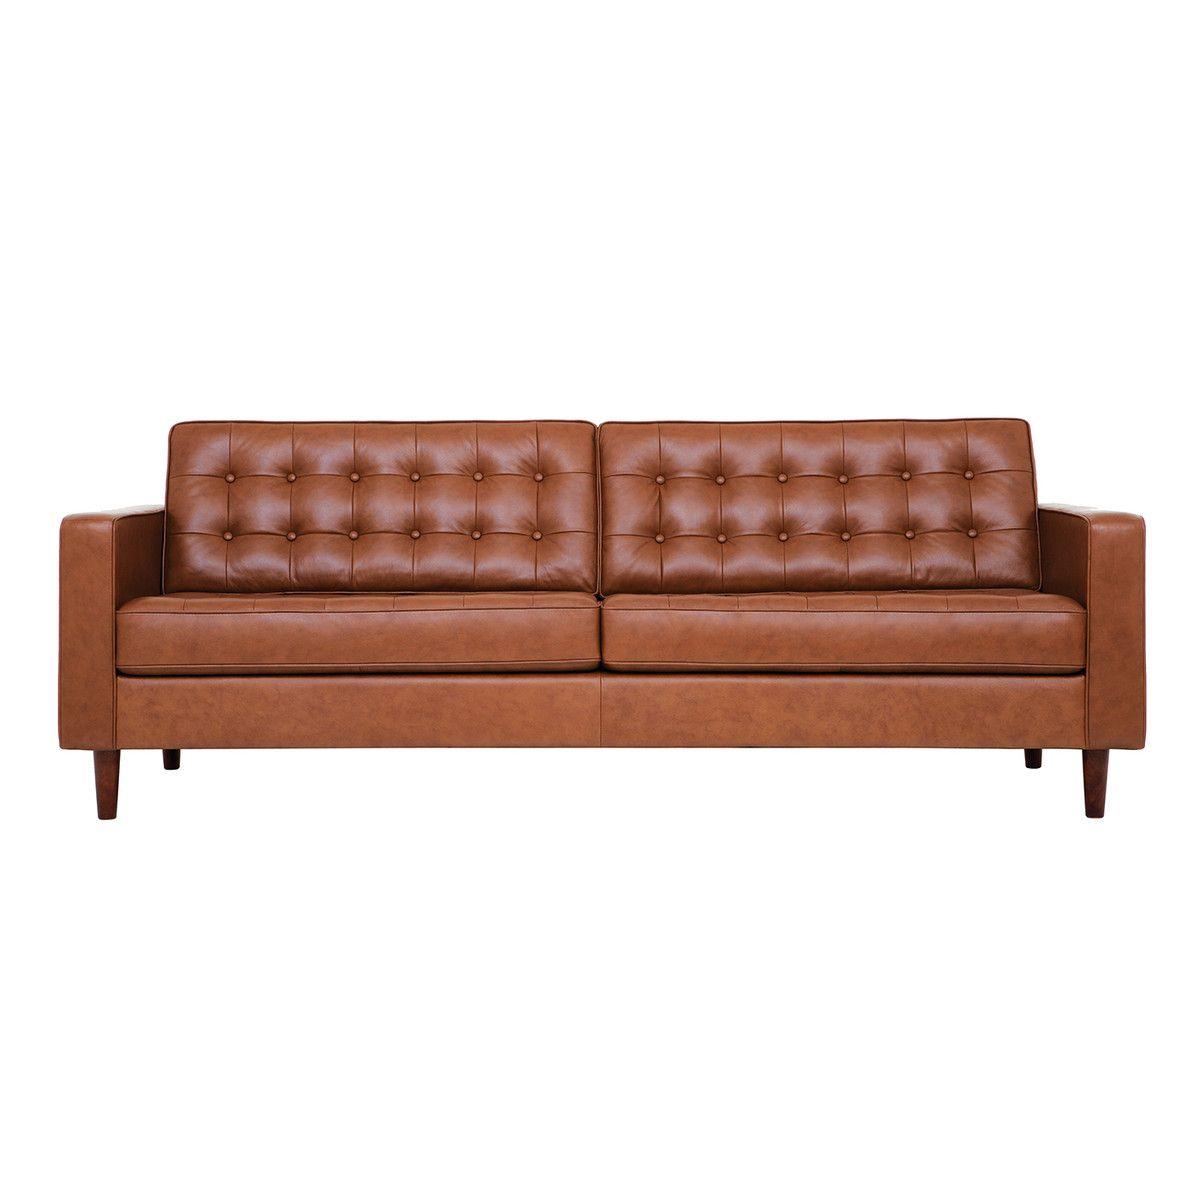 Reverie Sofa Sahara Wood Vintage Leather Chairs Leather Sofa Classic Sofa